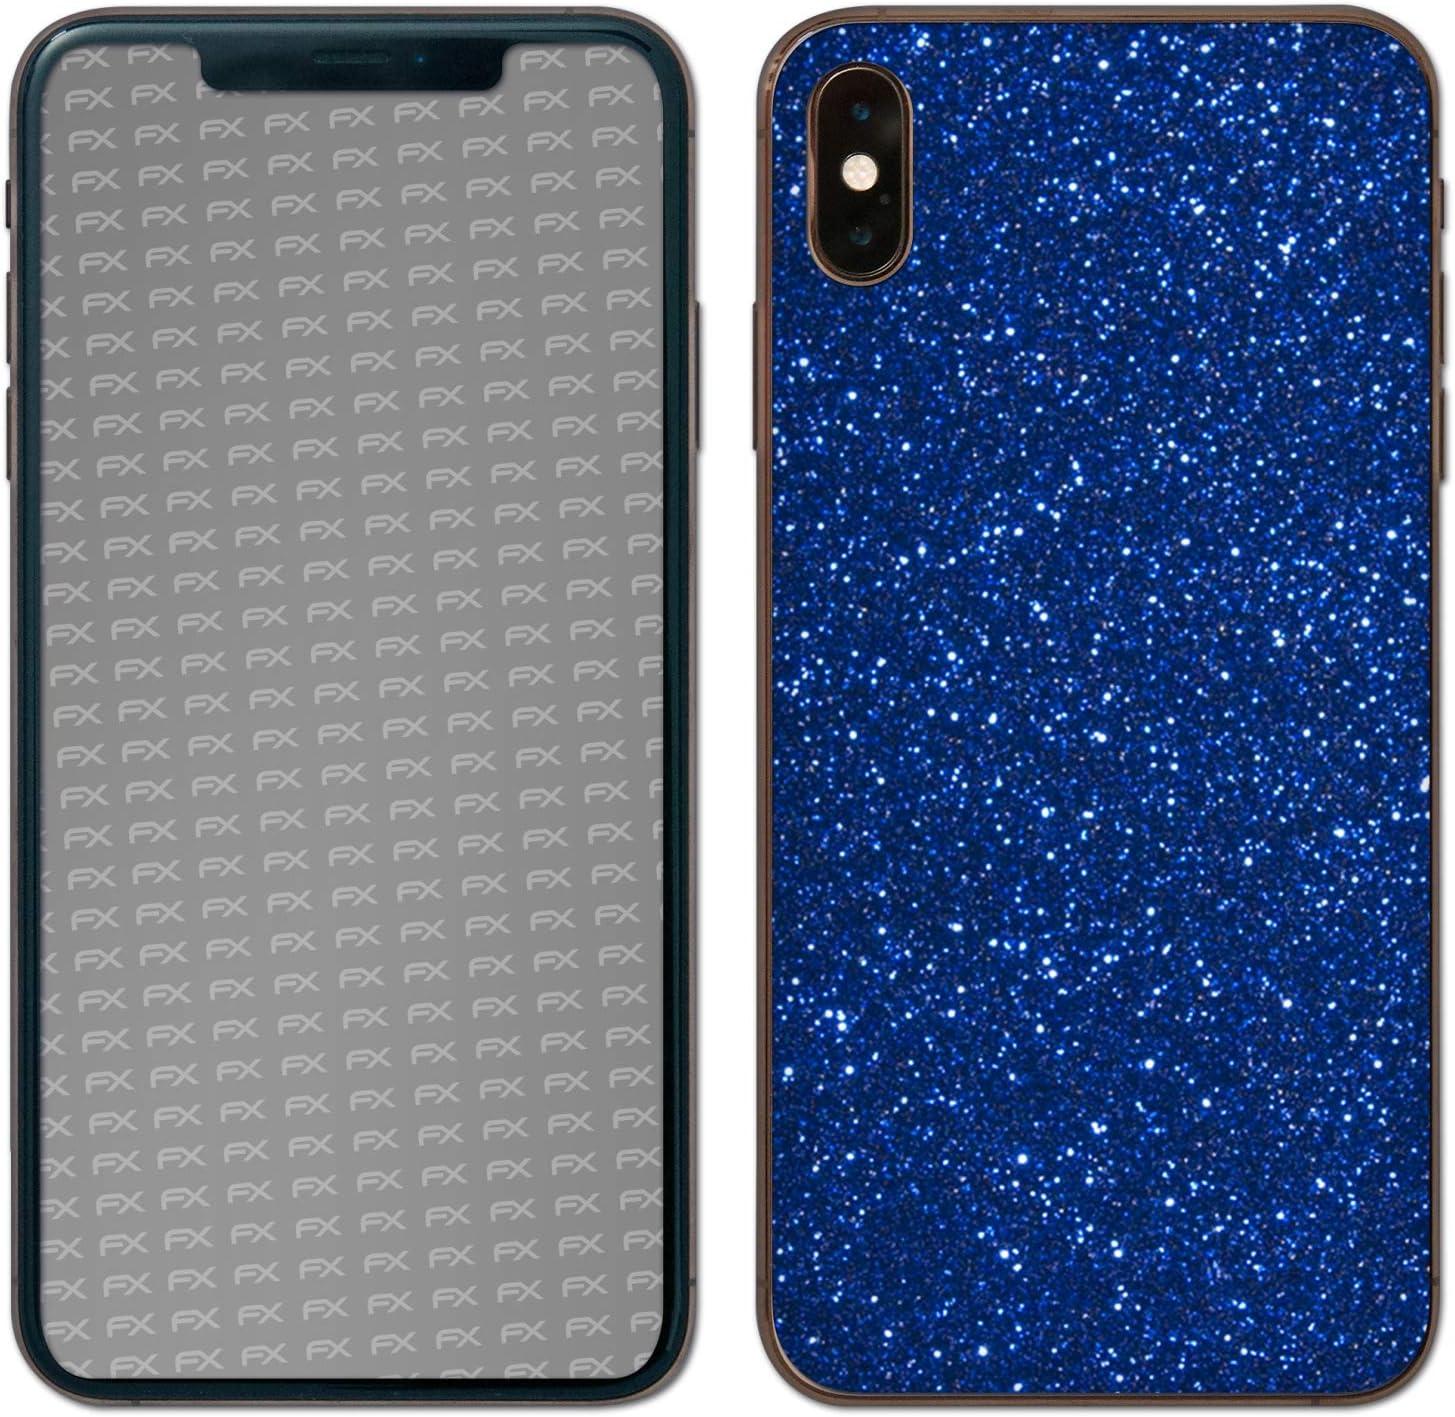 FX-Glitter-Sterling-Silver Feuille Scintillante r/éfl/échissante atFoliX Skin Compatible avec Apple iPhone XS Max Back Cover Sticker Autocollant